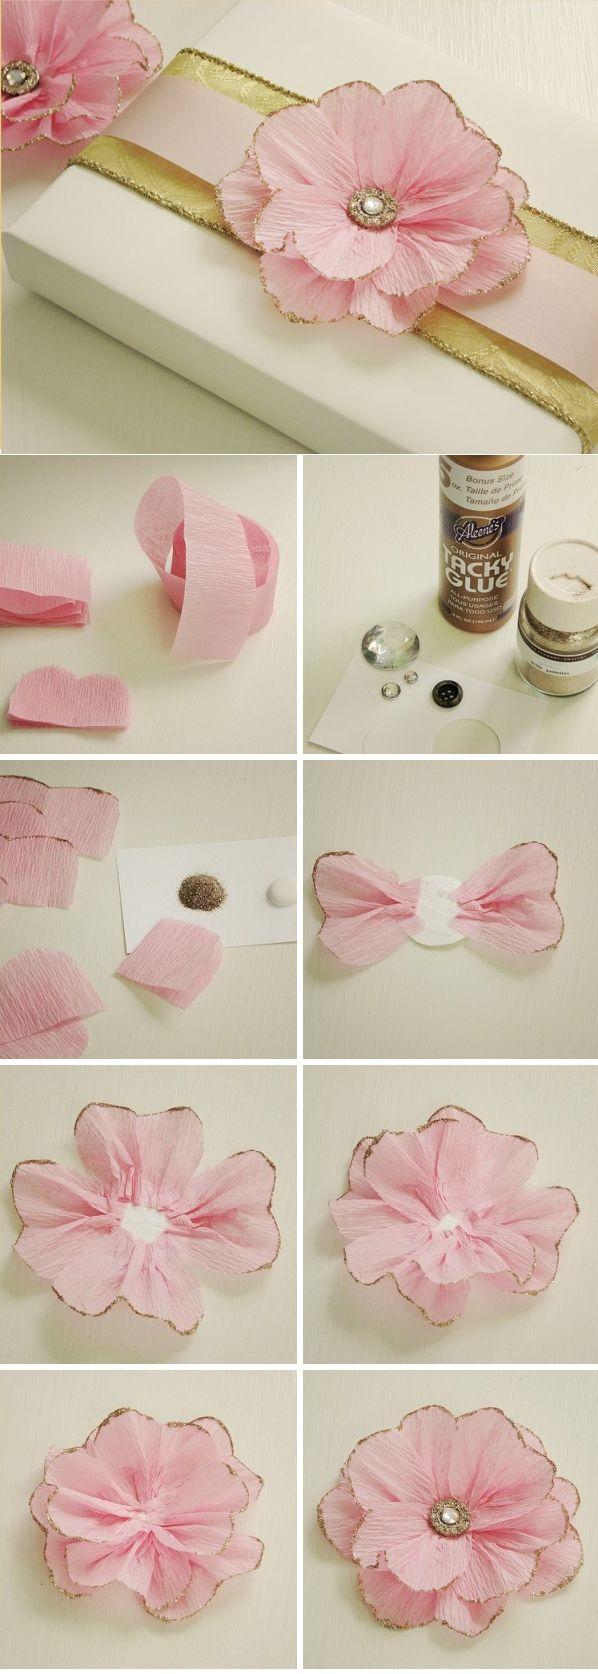 Gift idea: crepe paper flowers